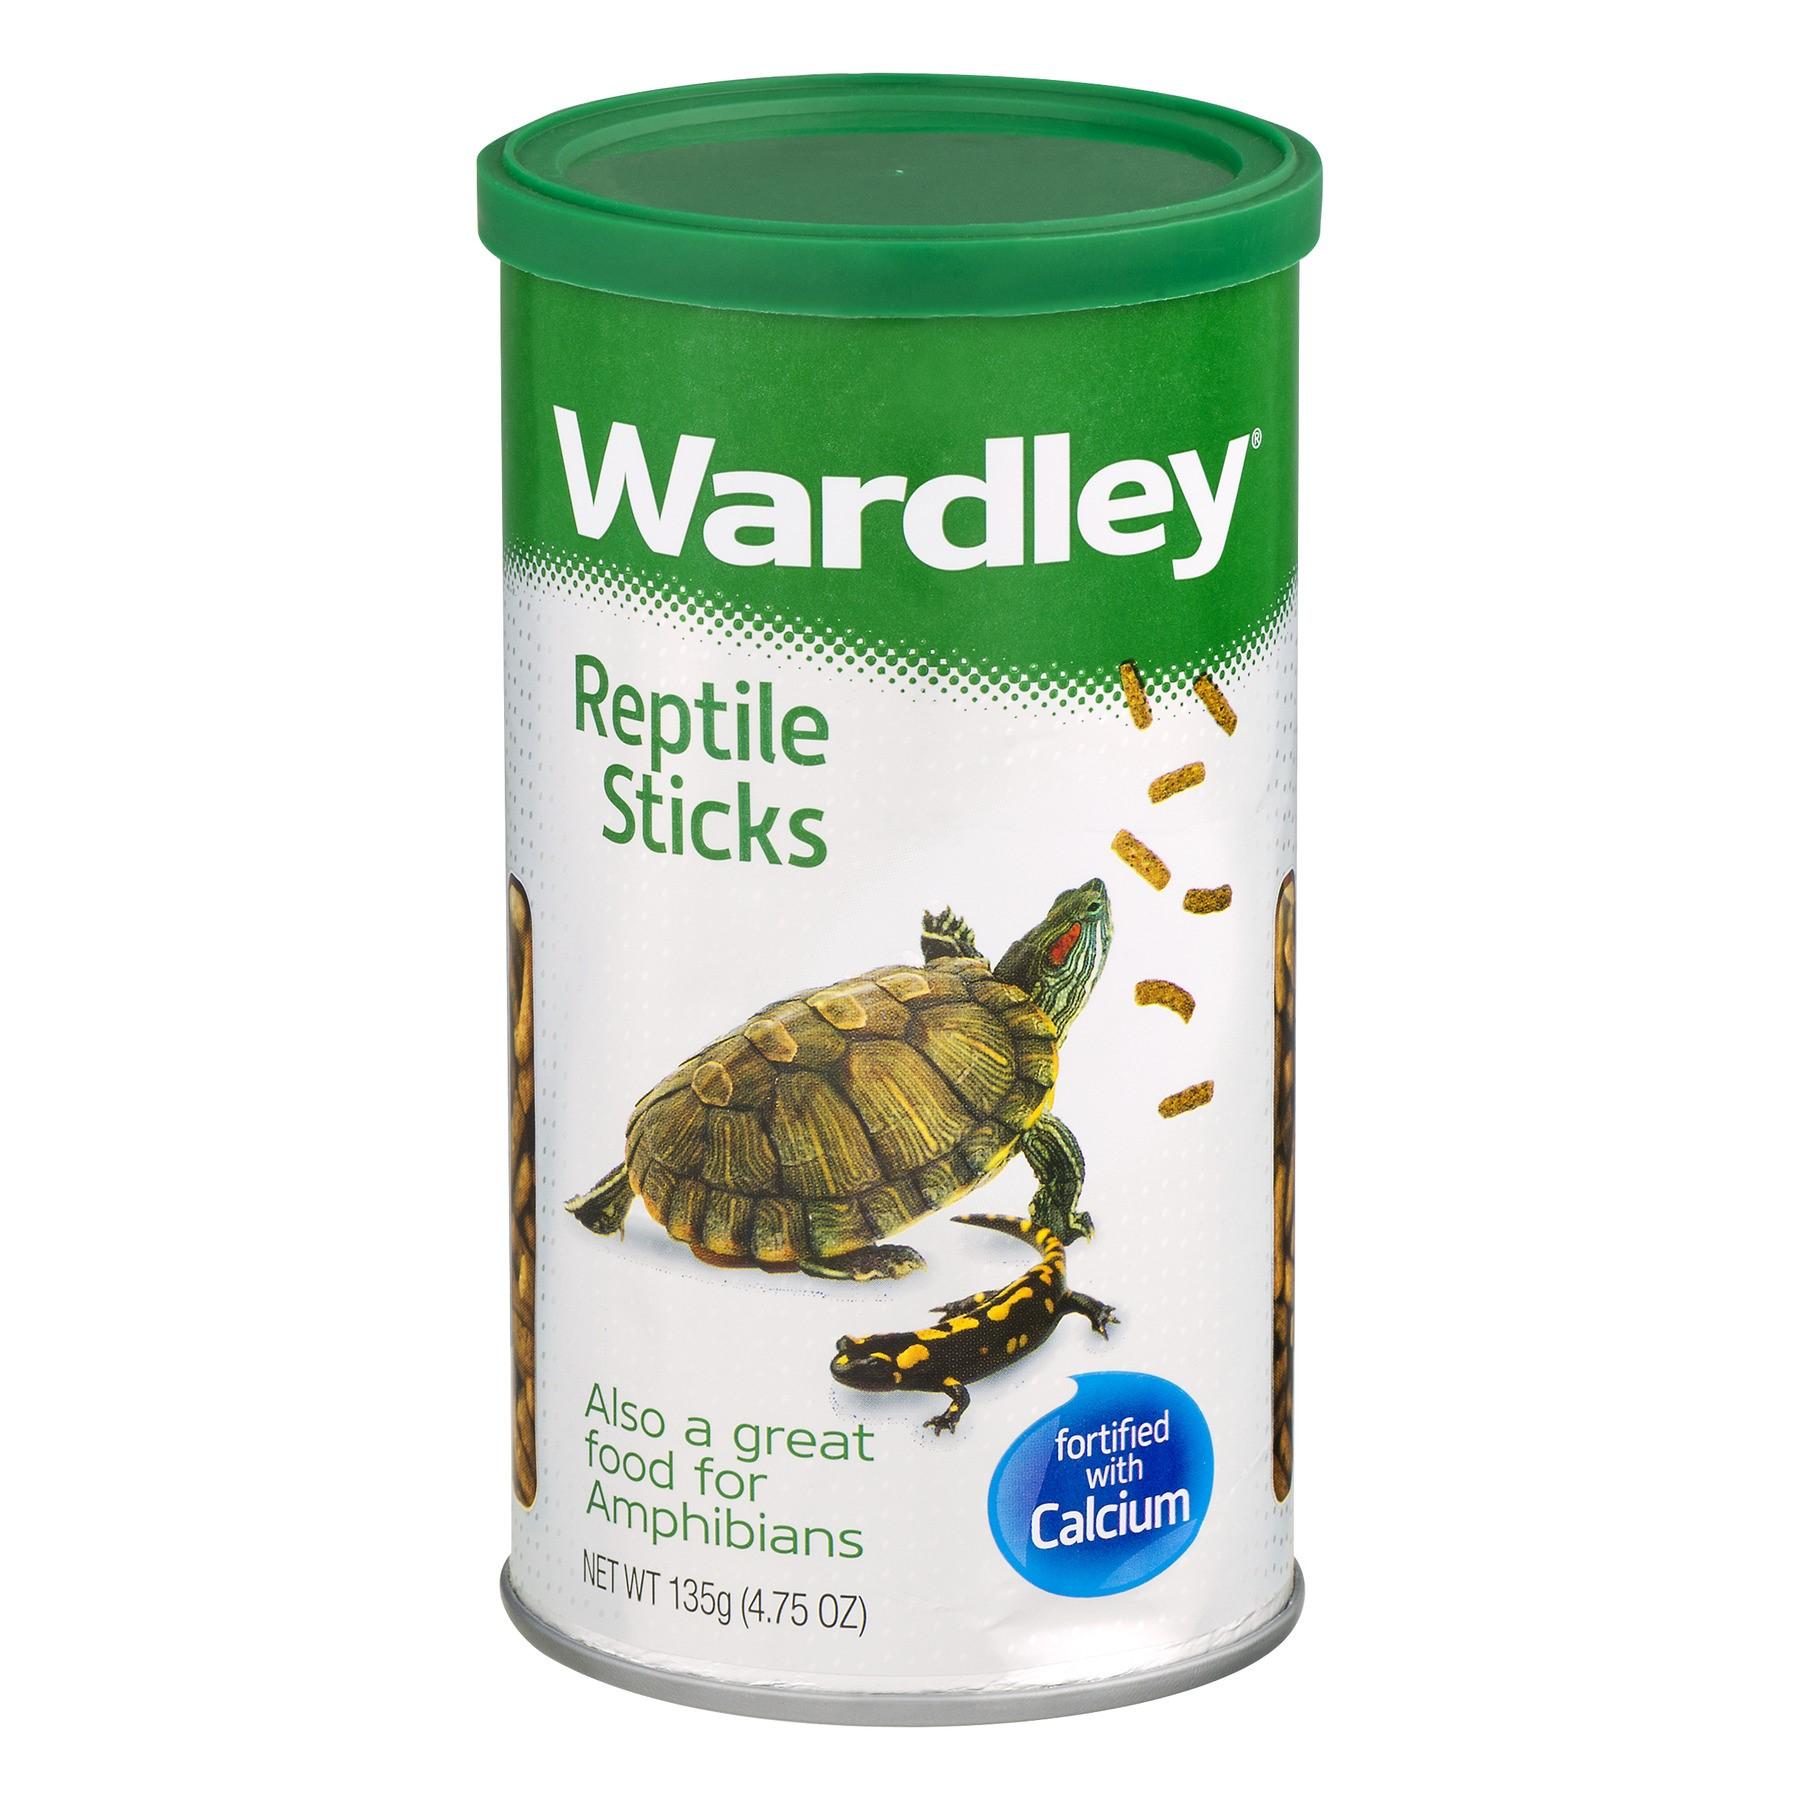 Wardley Reptile Sticks, 4.75 OZ